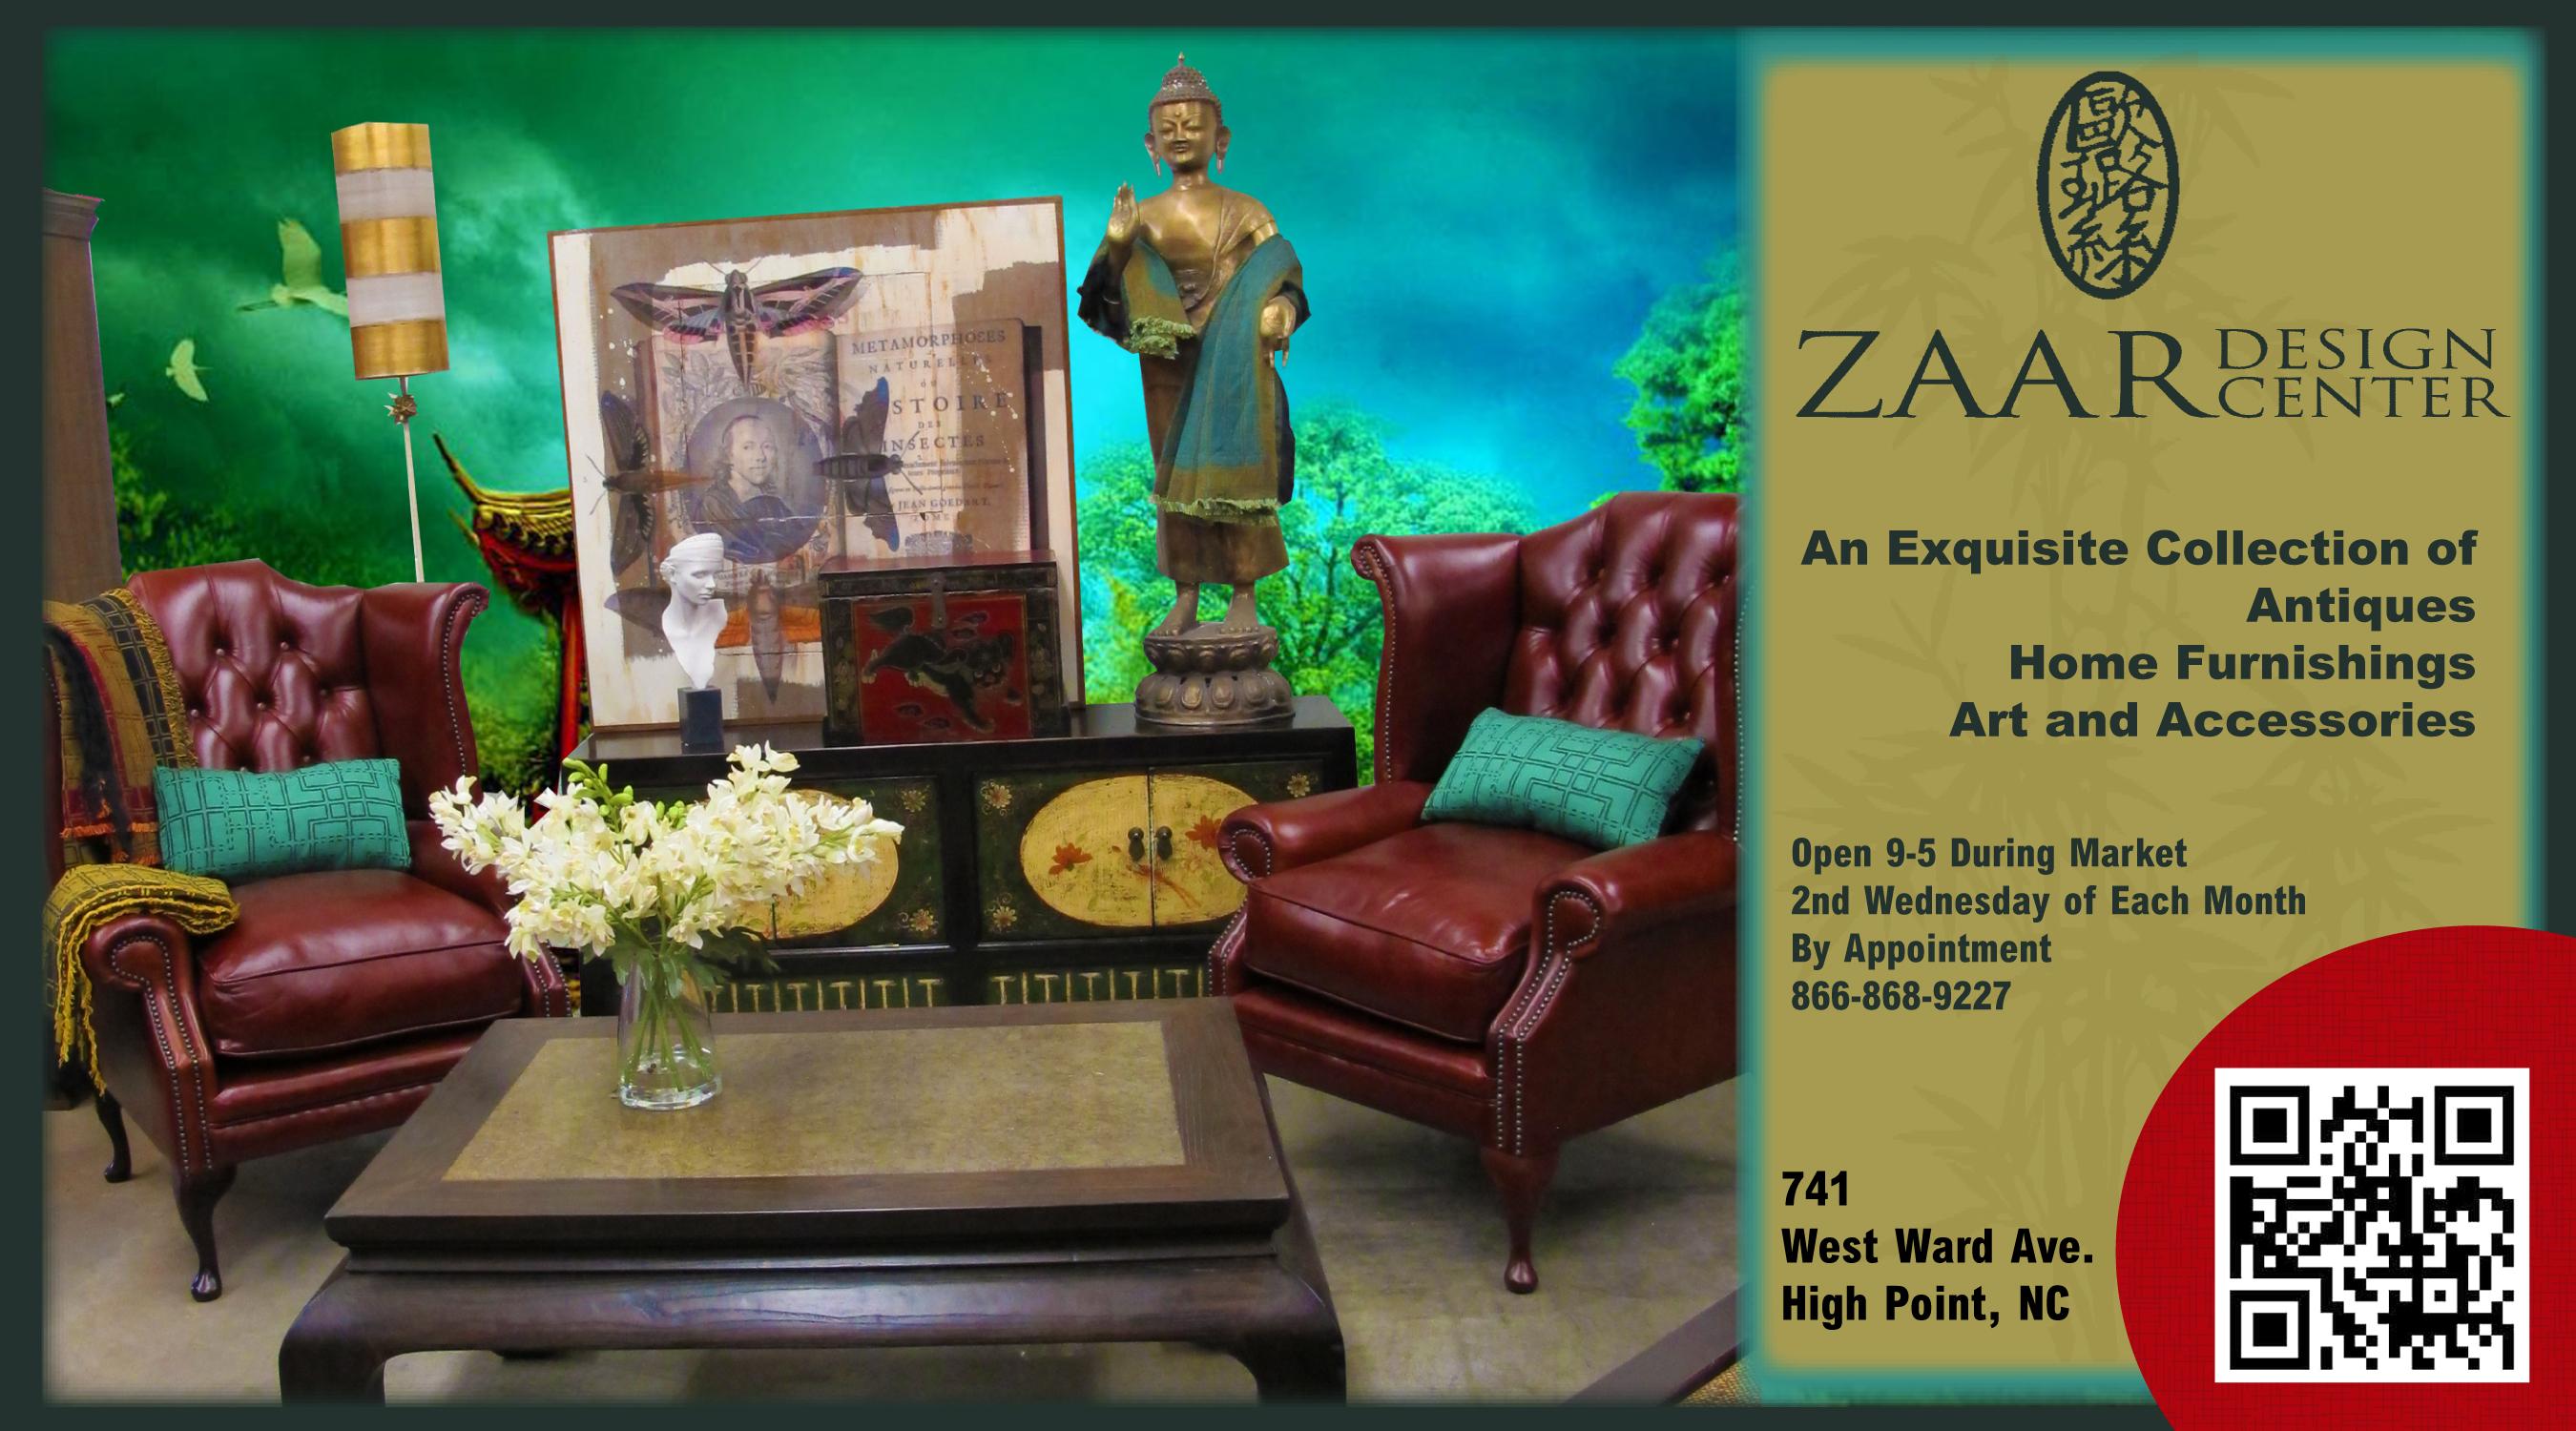 ZAAR Design Center